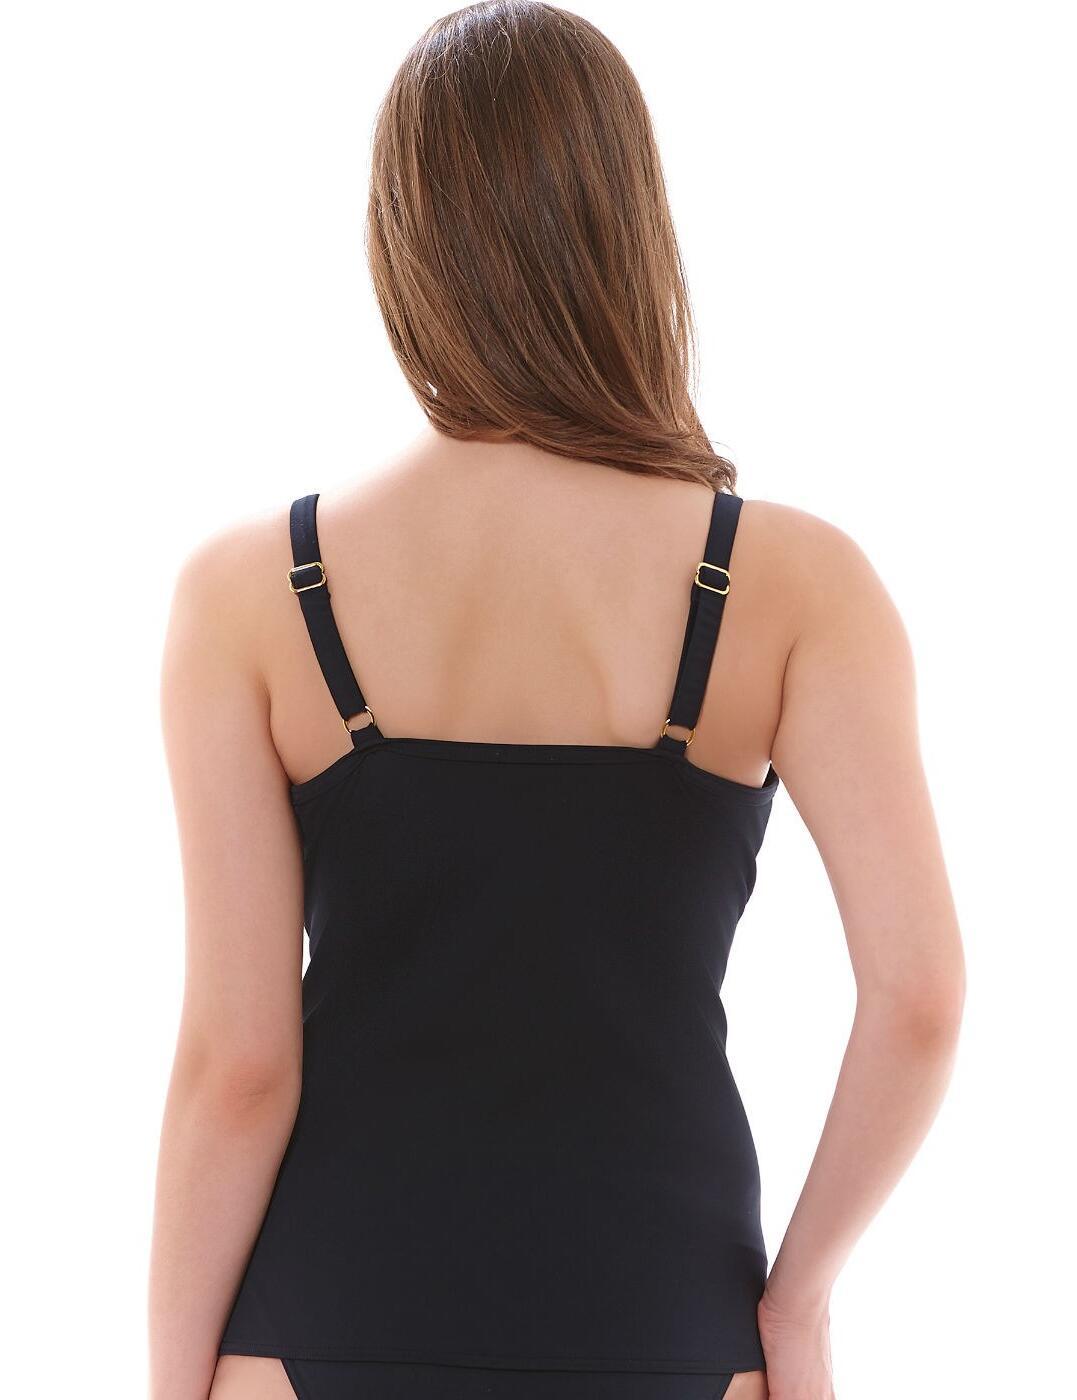 Freya Deco Padded Moulded Tankini Top 3869 Underwired Womens Swimwear